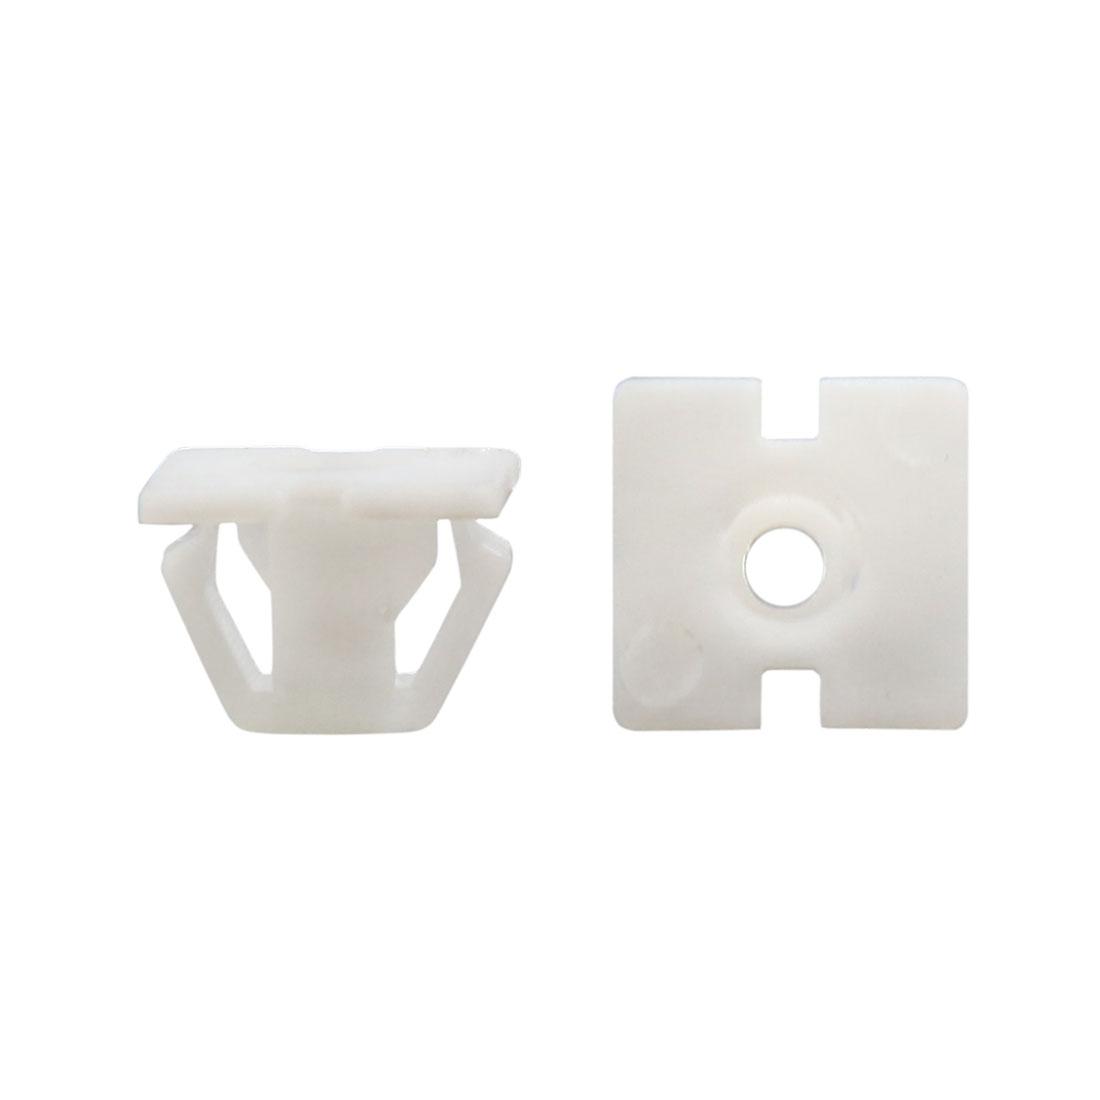 20Pcs Universal Plastic Rivet Fastener Mud Flaps Bumper Fender Clips White 13mm